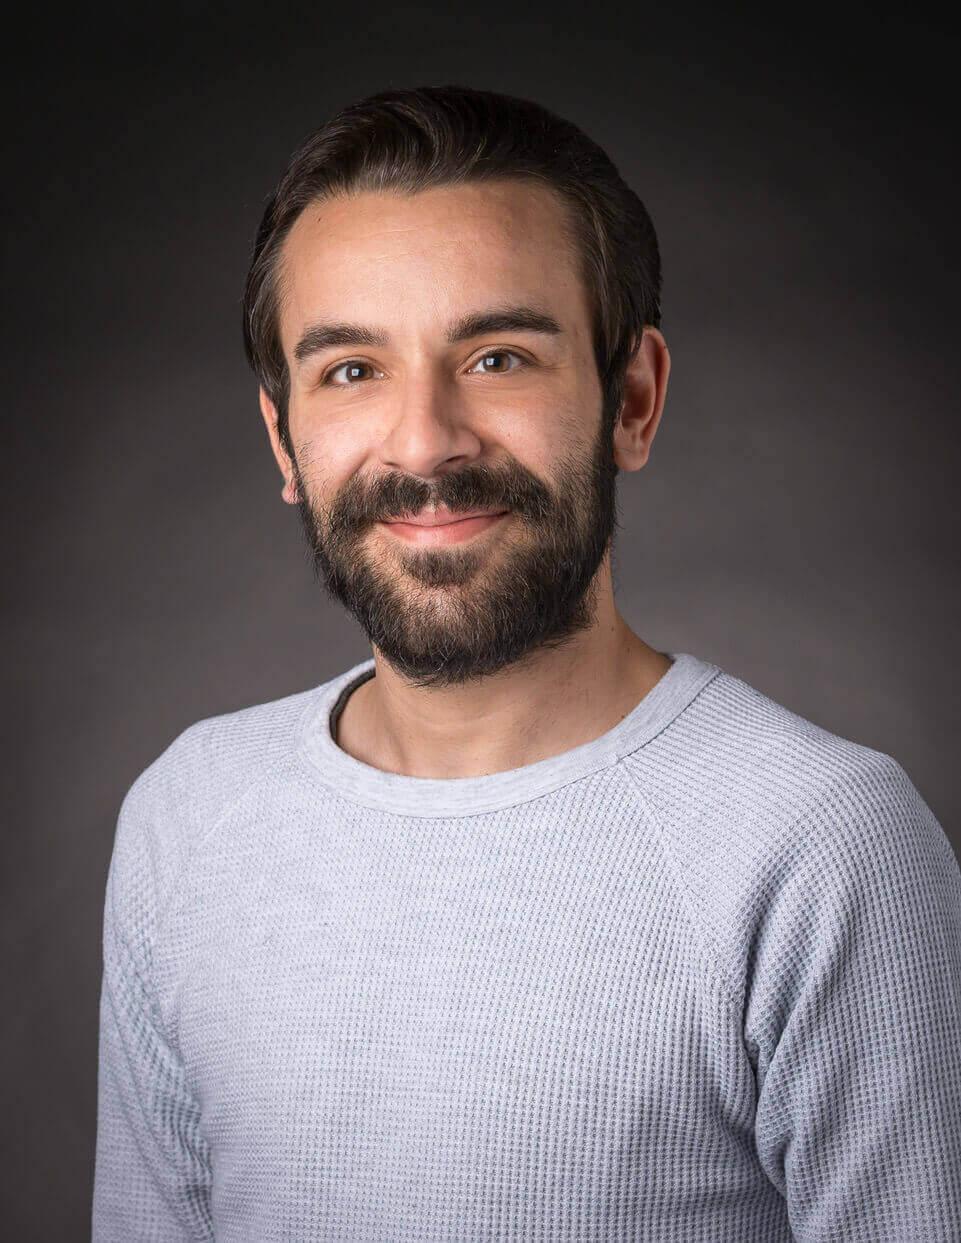 David Lopes